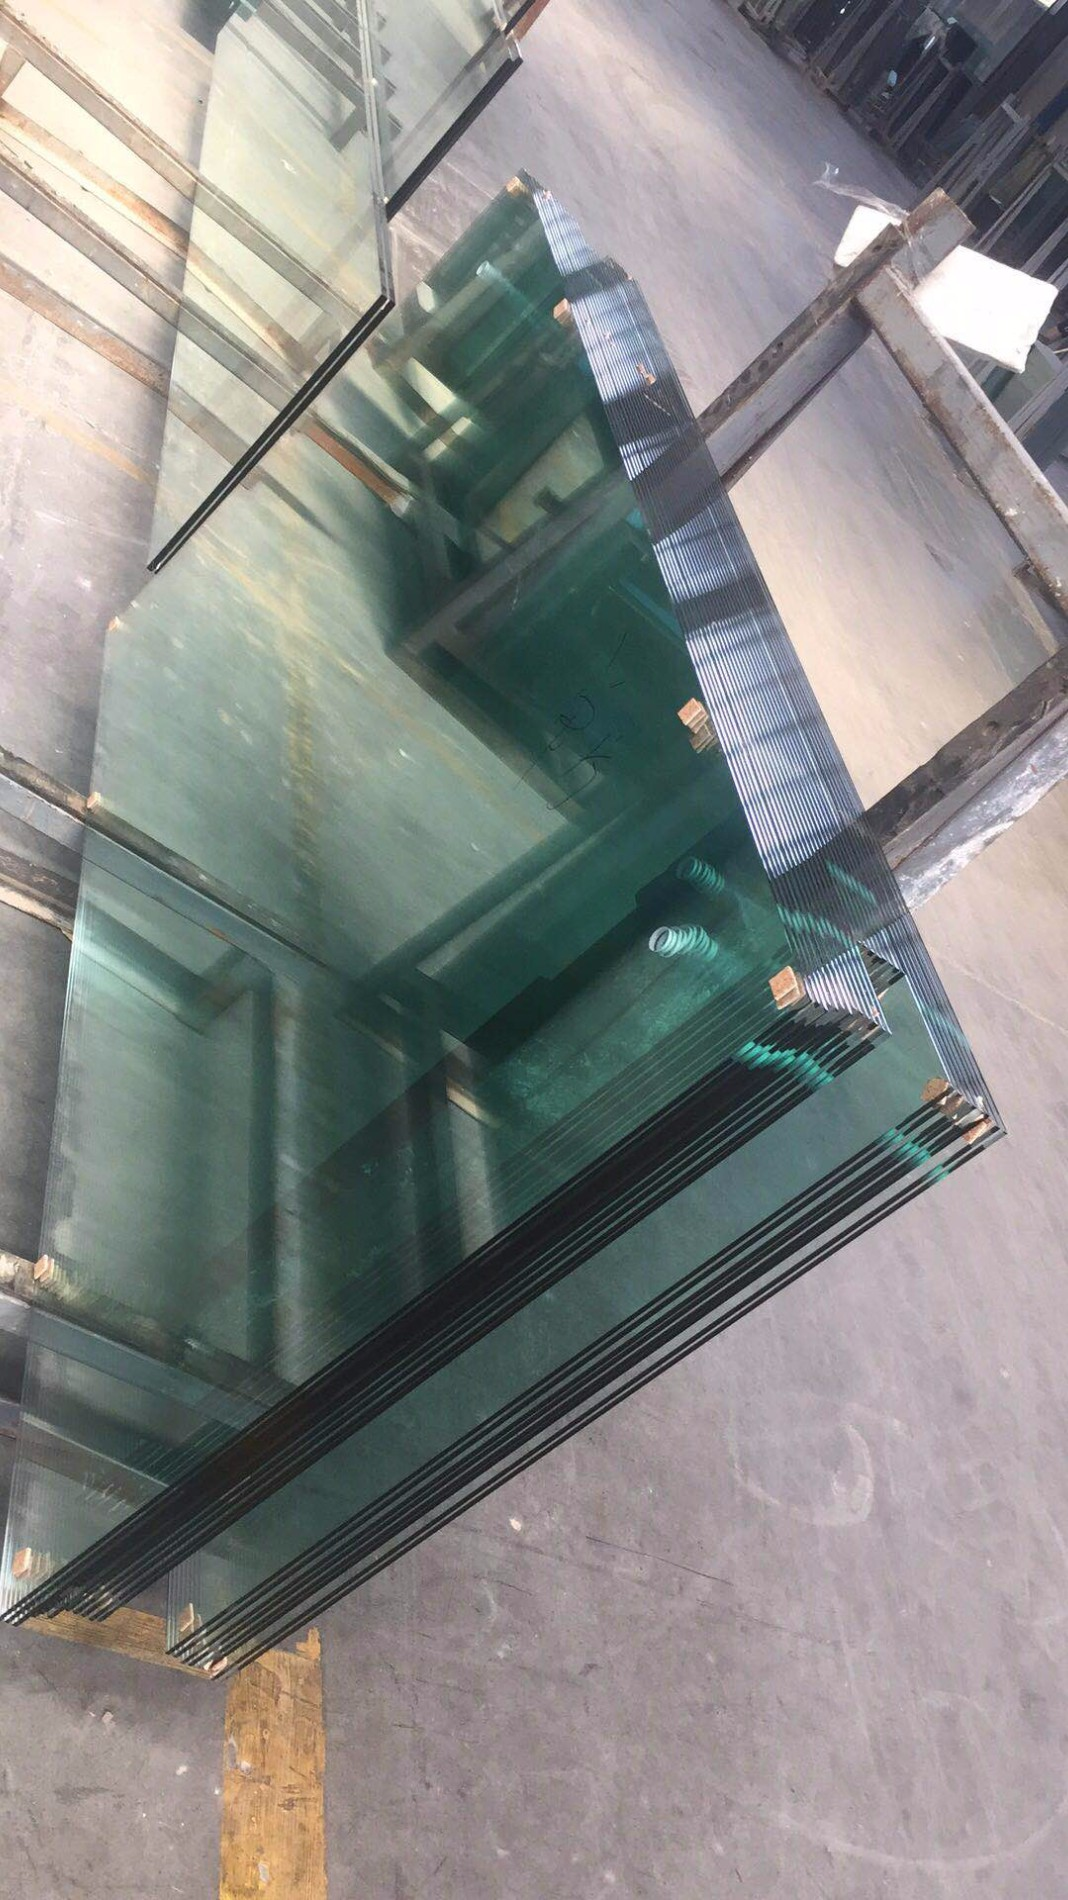 Ocean Blue Tempered Glass Manufacturers, Ocean Blue Tempered Glass Factory, Ocean Blue Tempered Glass